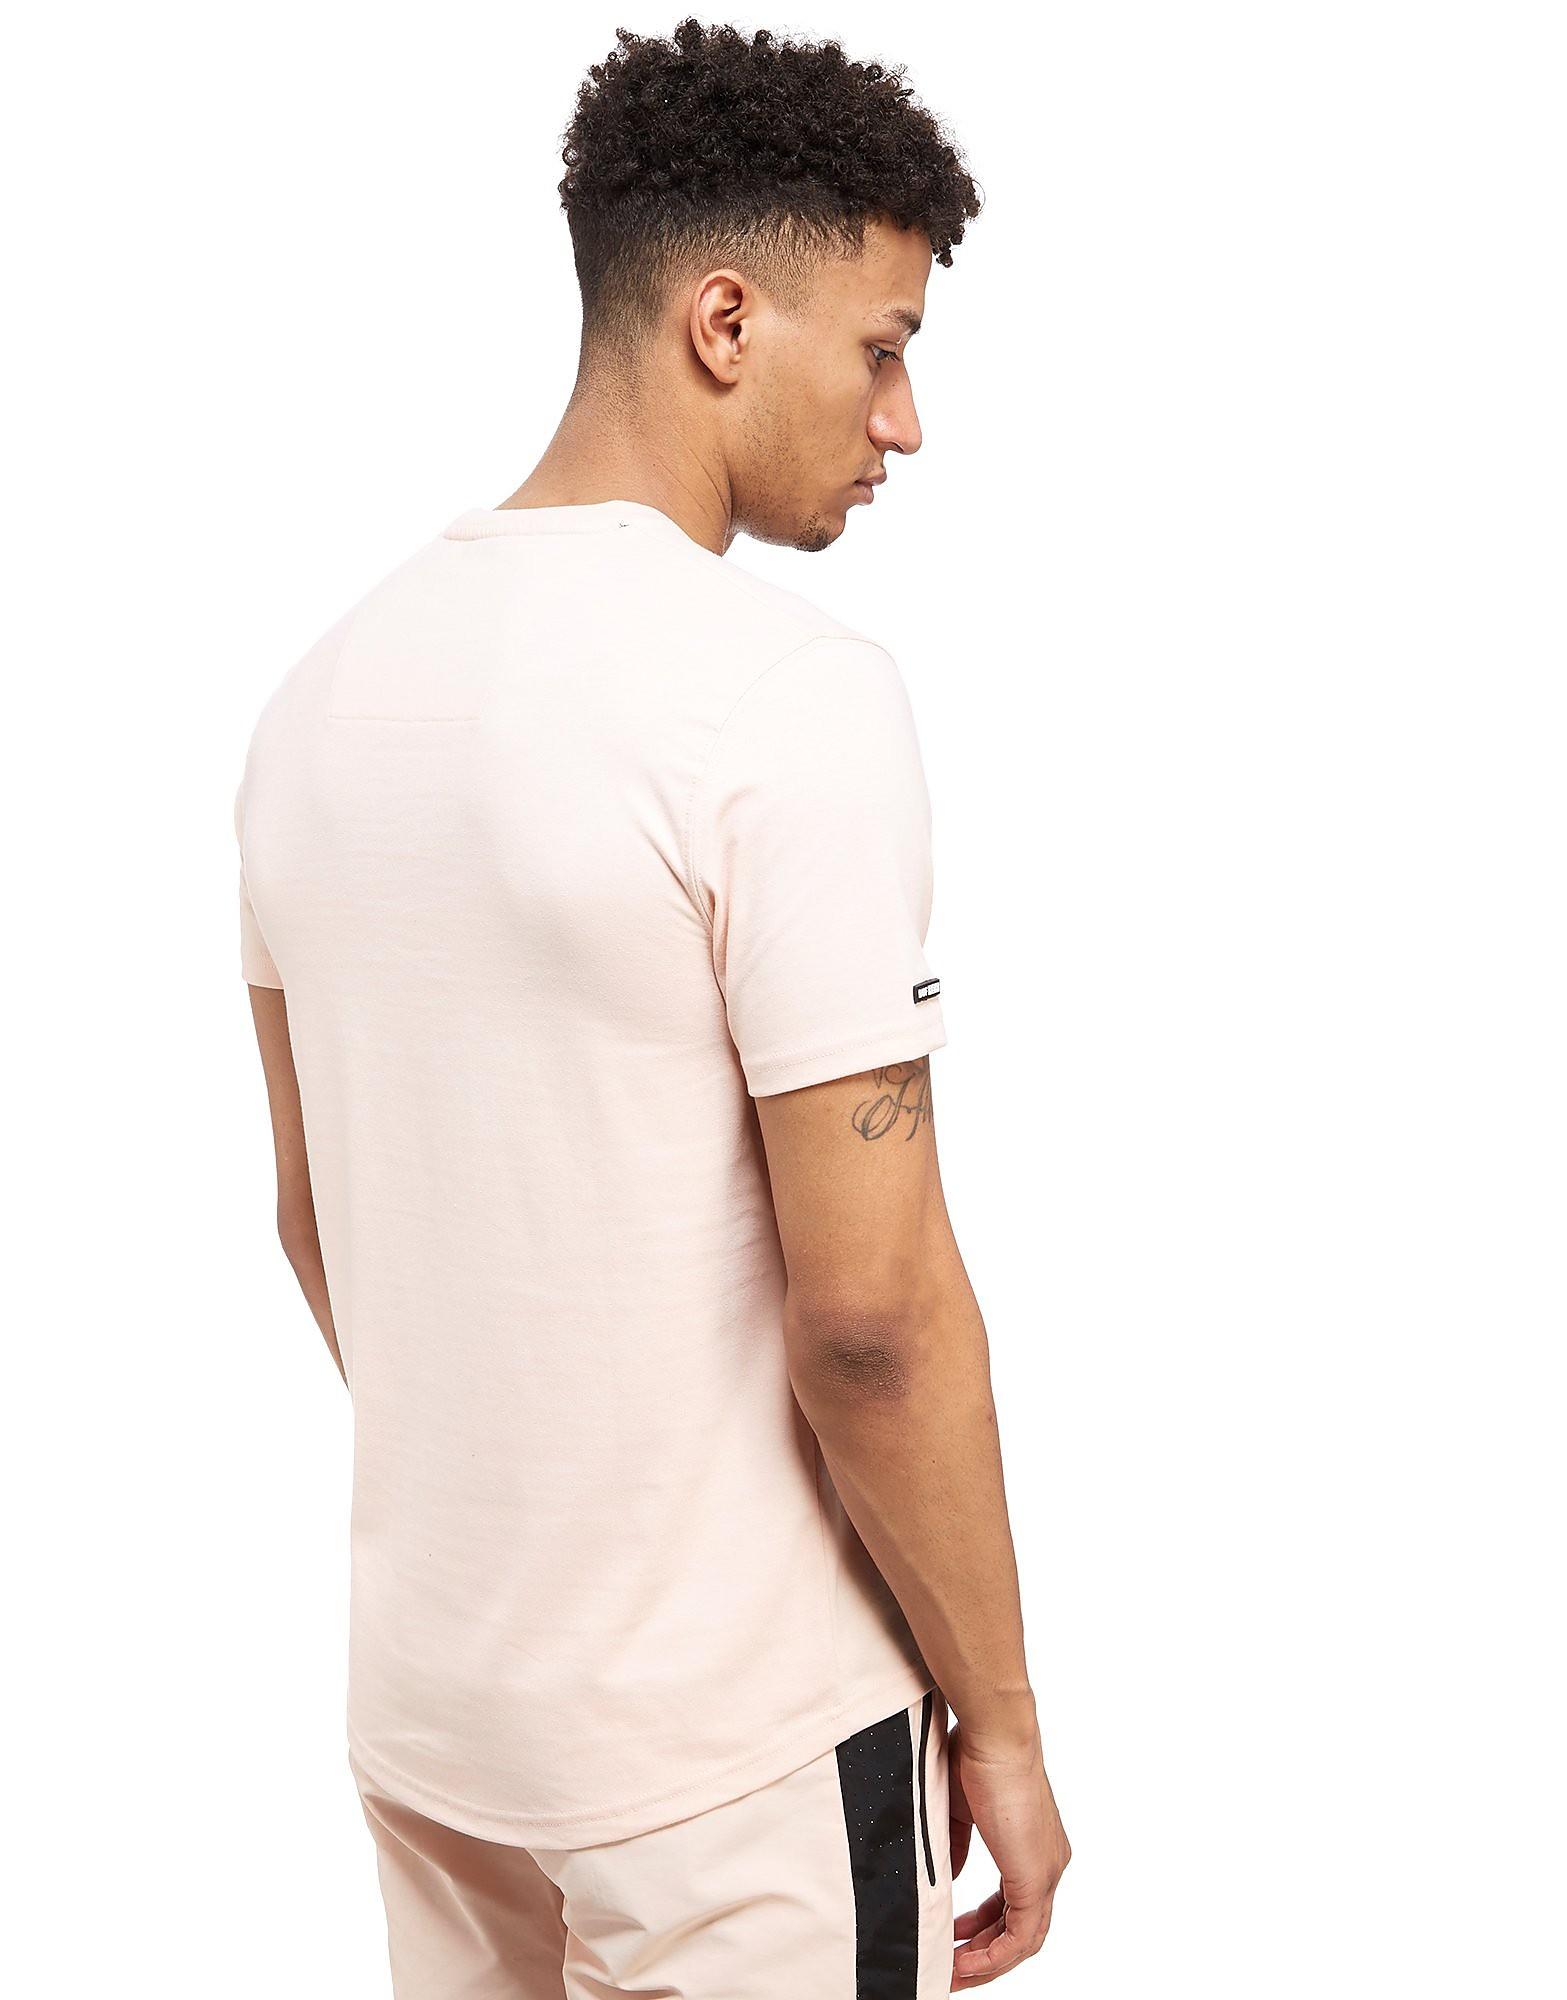 Duffer of St George Metre T-Shirt